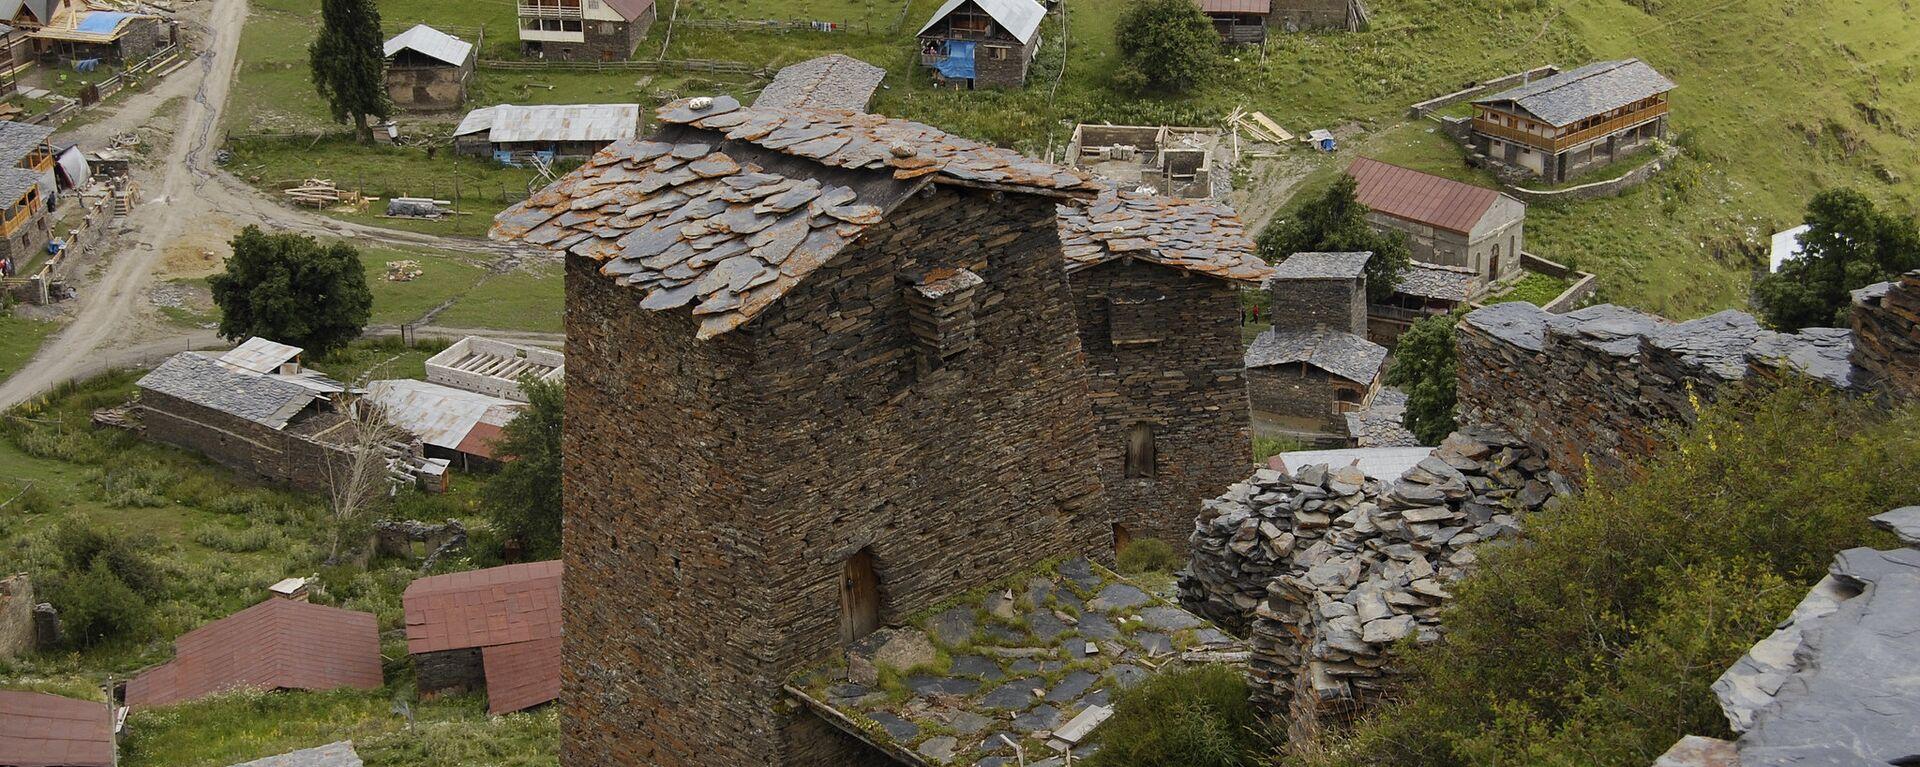 Село Омало в регионе Тушети - Sputnik Грузия, 1920, 27.05.2021